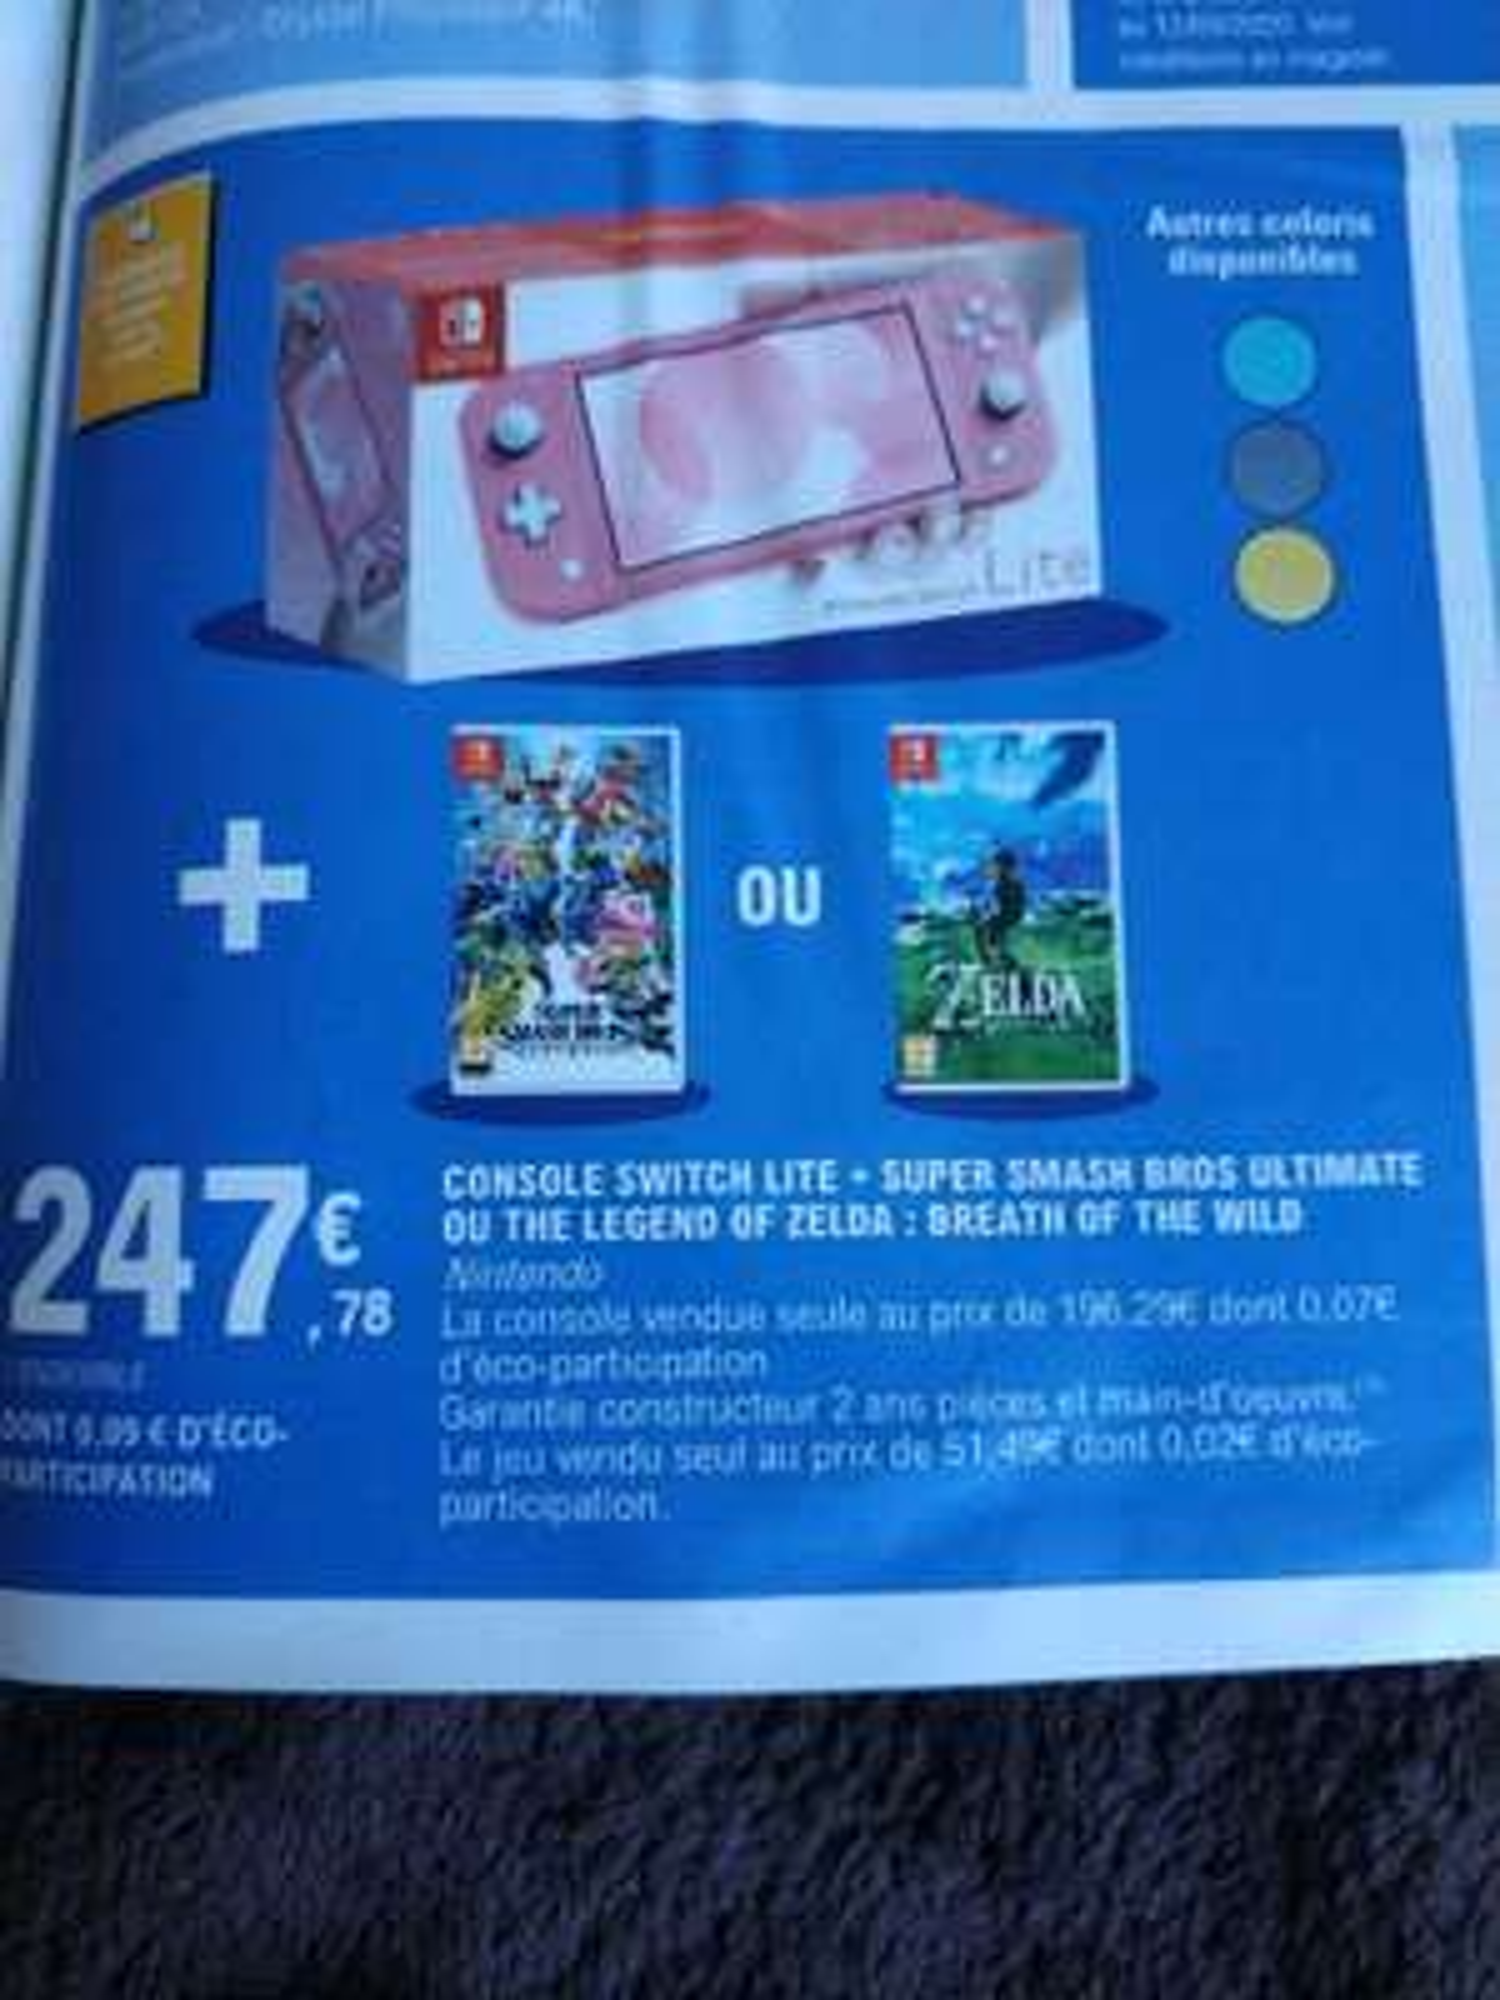 Console portable Nintendo Switch Lite - Plusieurs coloris + Jeu The Legend of Zelda ou Super Smash Bros